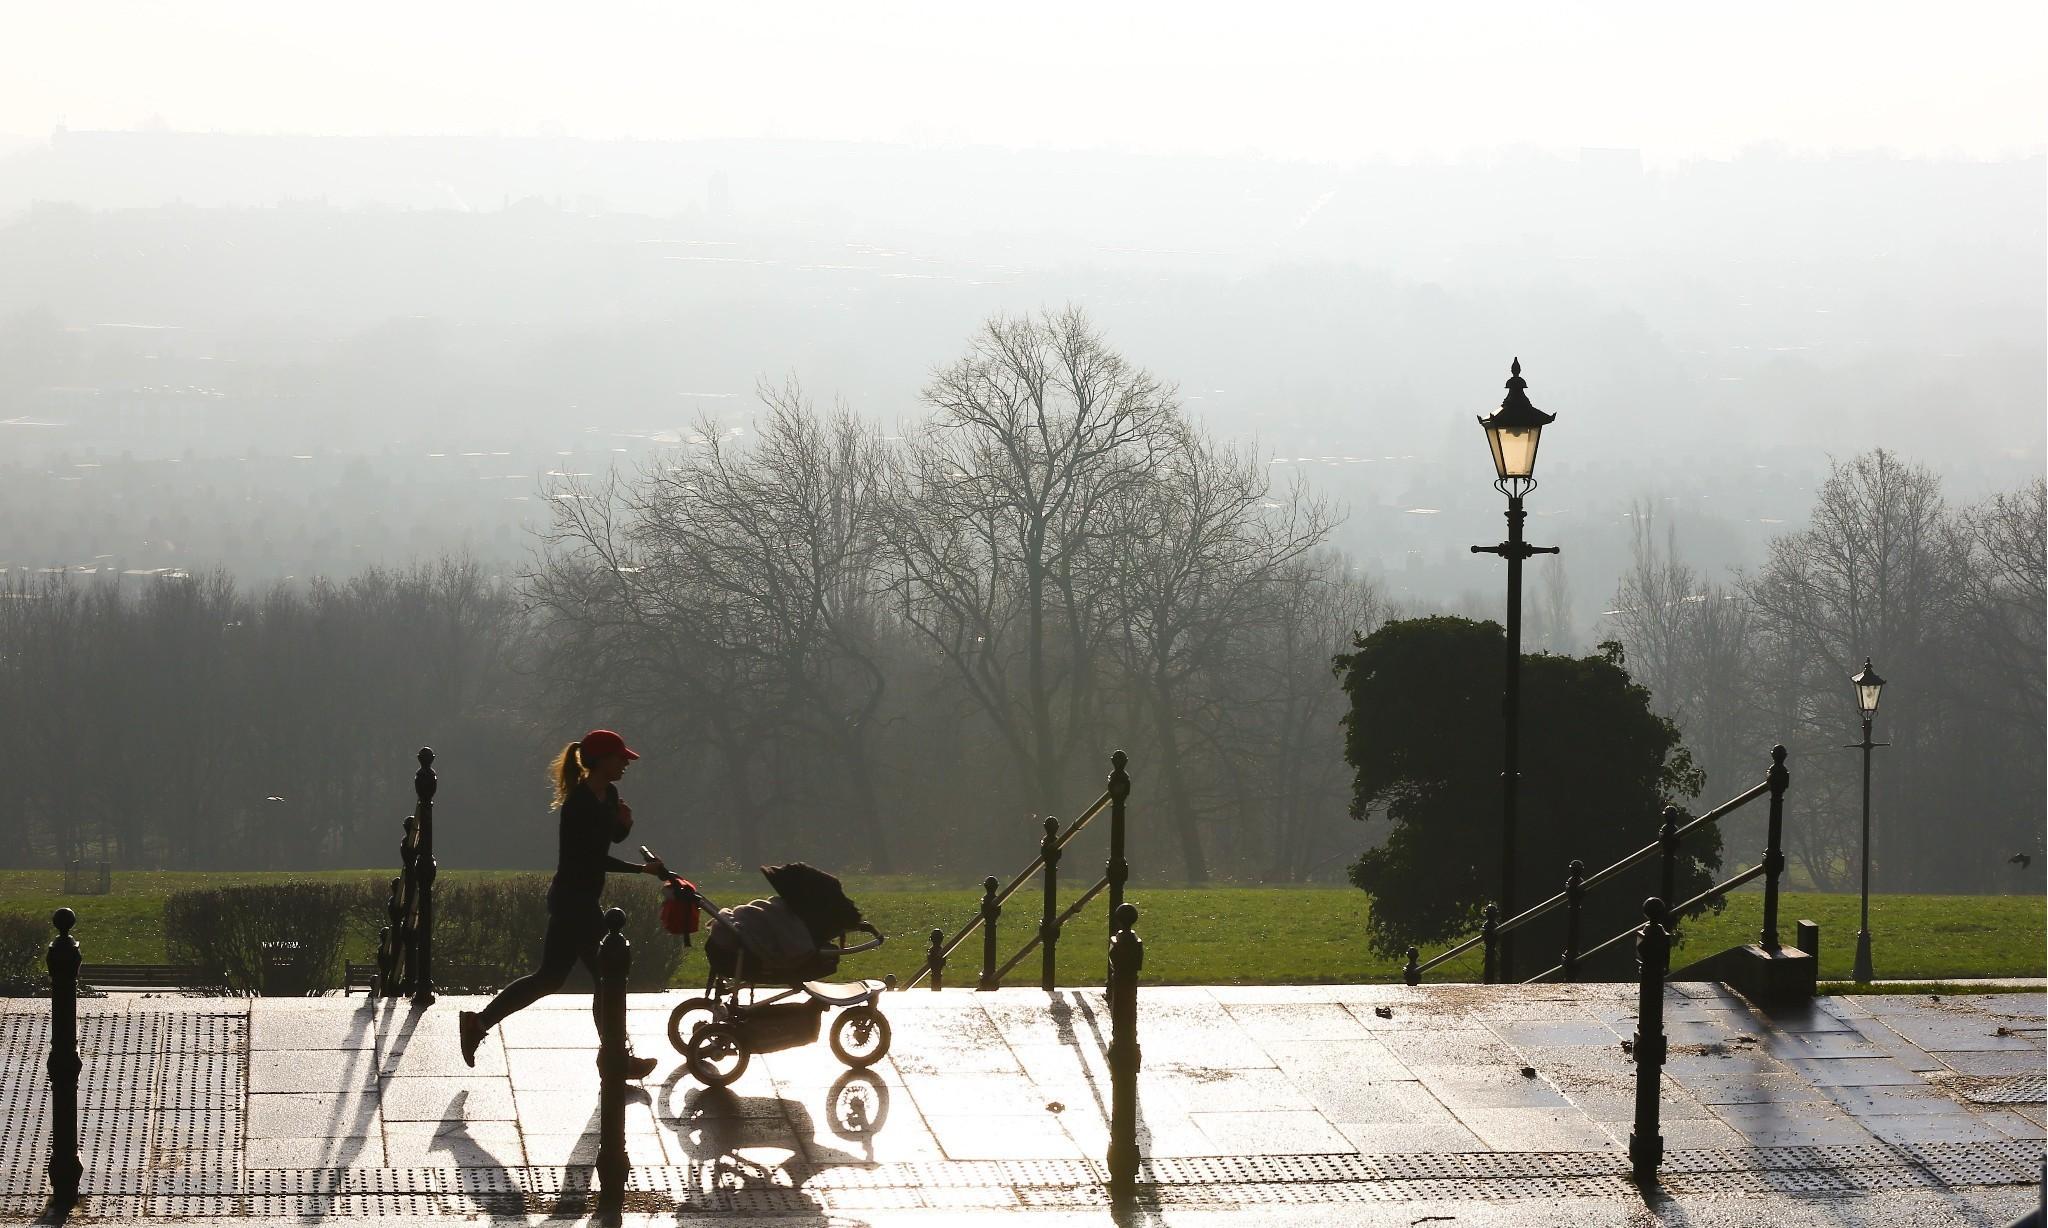 Air pollution crisis 'plagues' UK, finds UN human rights expert